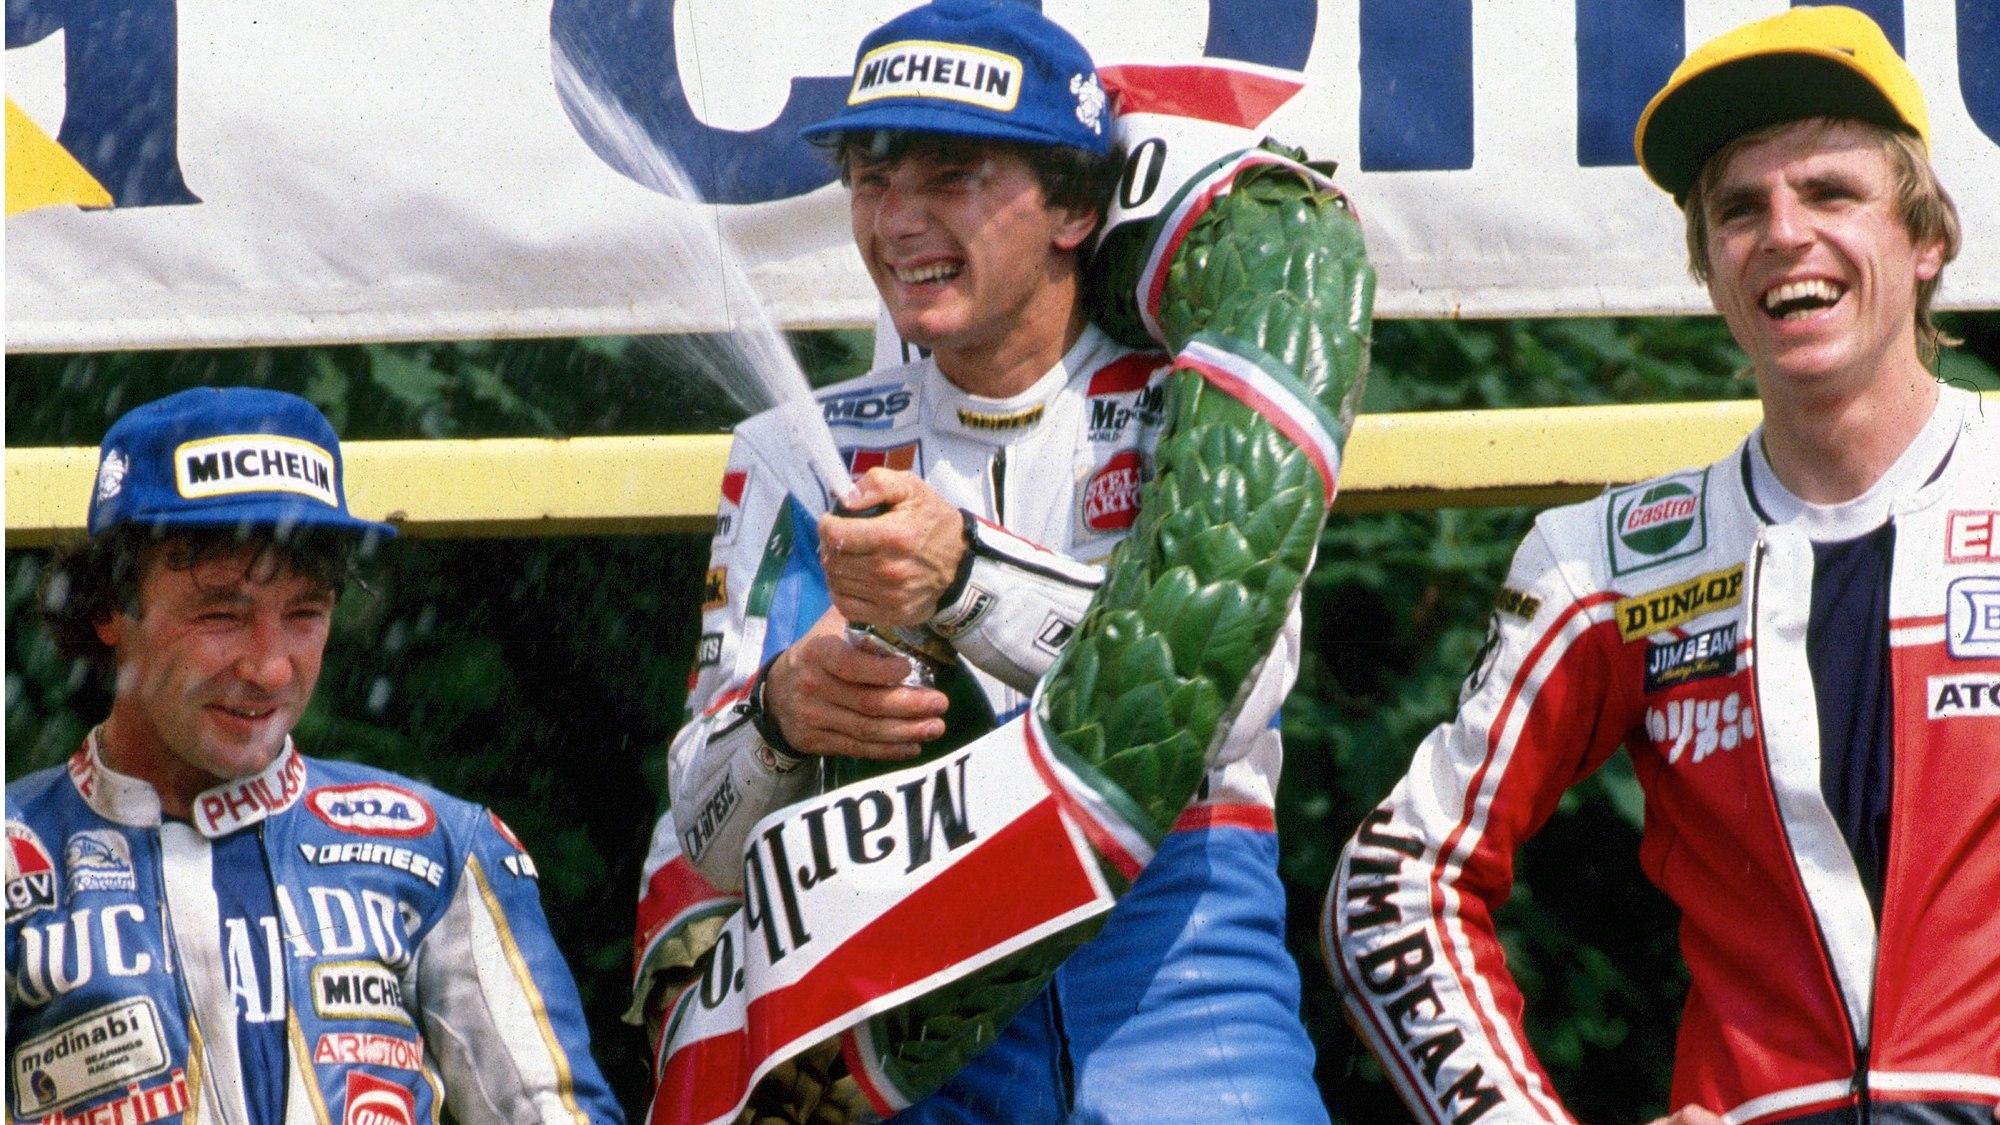 Fausto Gresini, 1986 Italian 125cc